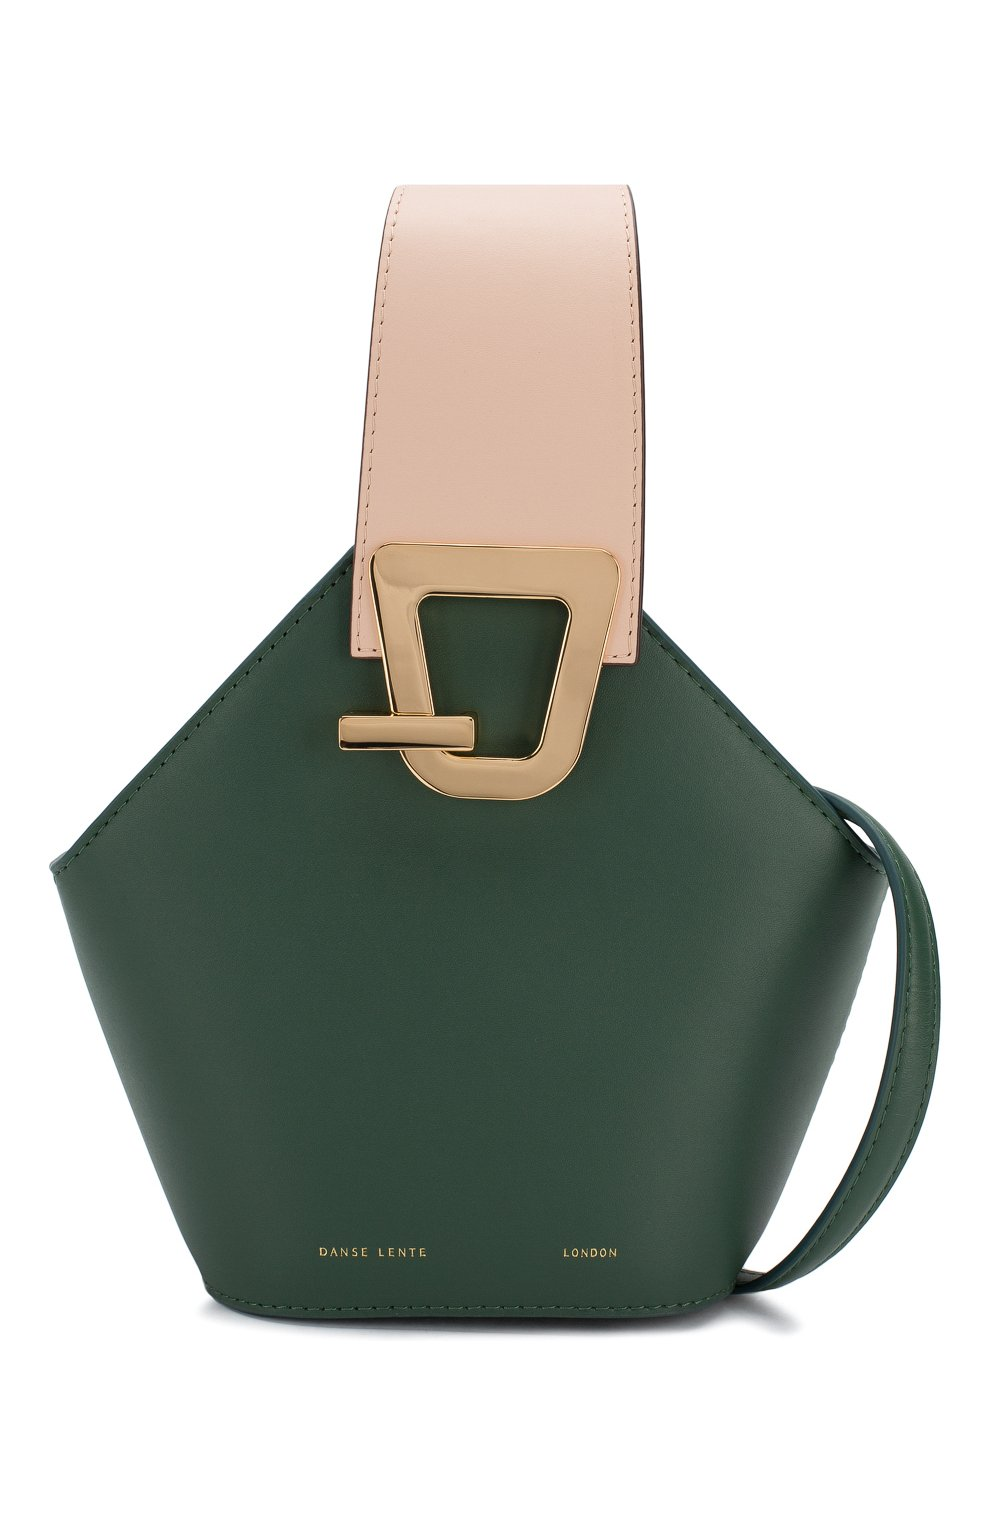 Женская сумка johnny mini DANSE LENTE зеленого цвета, арт. MINI J0HNNY/GARDEN/BLUSH G0LD | Фото 6 (Сумки-технические: Сумки через плечо, Сумки top-handle; Материал: Натуральная кожа; Размер: mini; Ремень/цепочка: На ремешке)